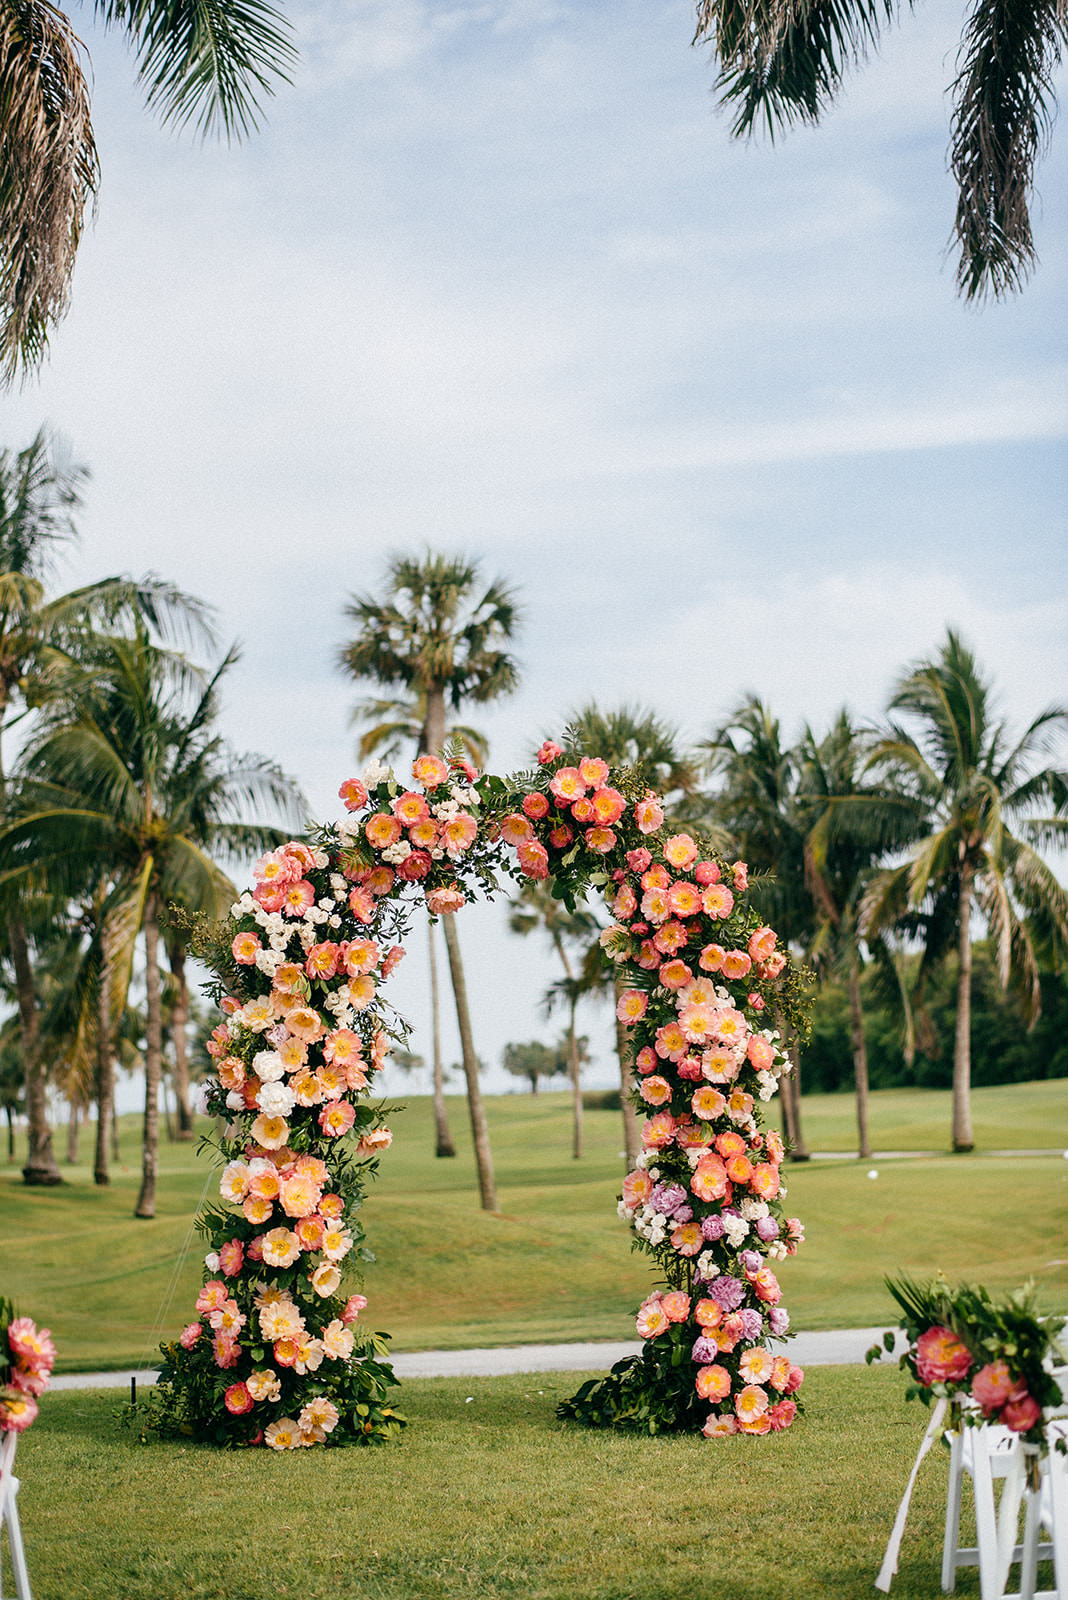 Tropical Wedding Ceremony Decor, Pink and Coral Lush Floral Arch   Boca Grande Wedding Venue Gasparilla Inn   Tampa Bay Wedding Planner NK Weddings